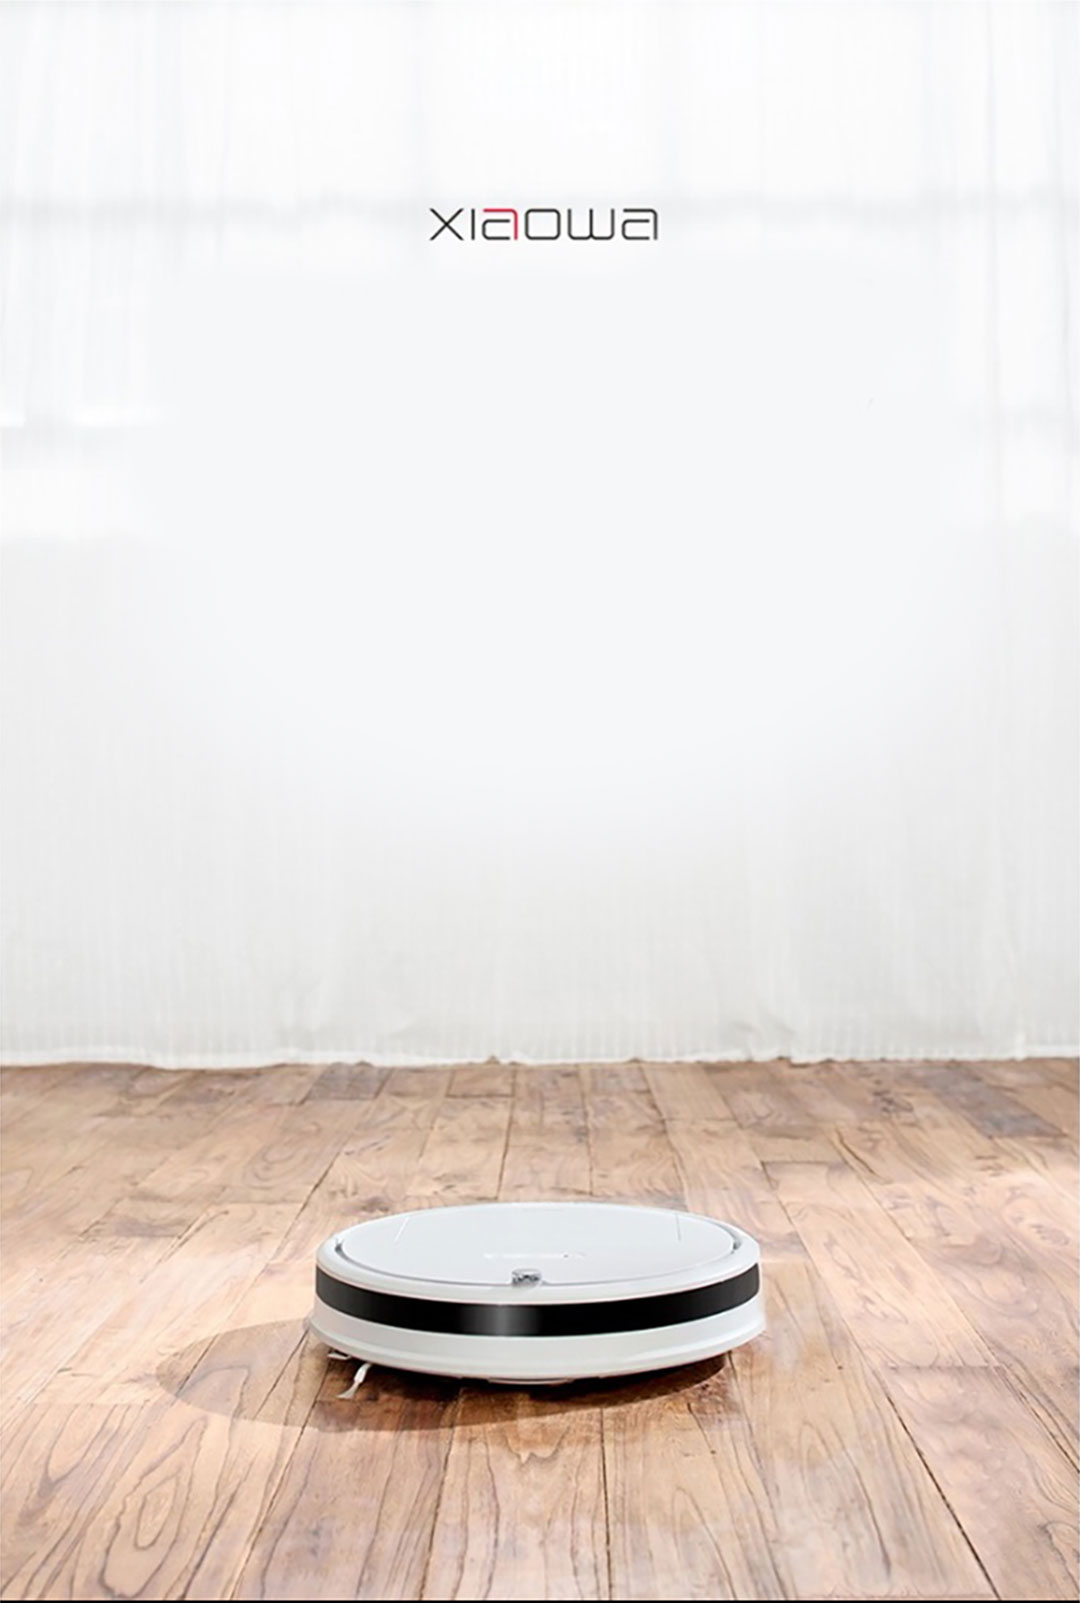 Xiaomi Xiaowa Robot Vacumm Cleaner – Planned Edition